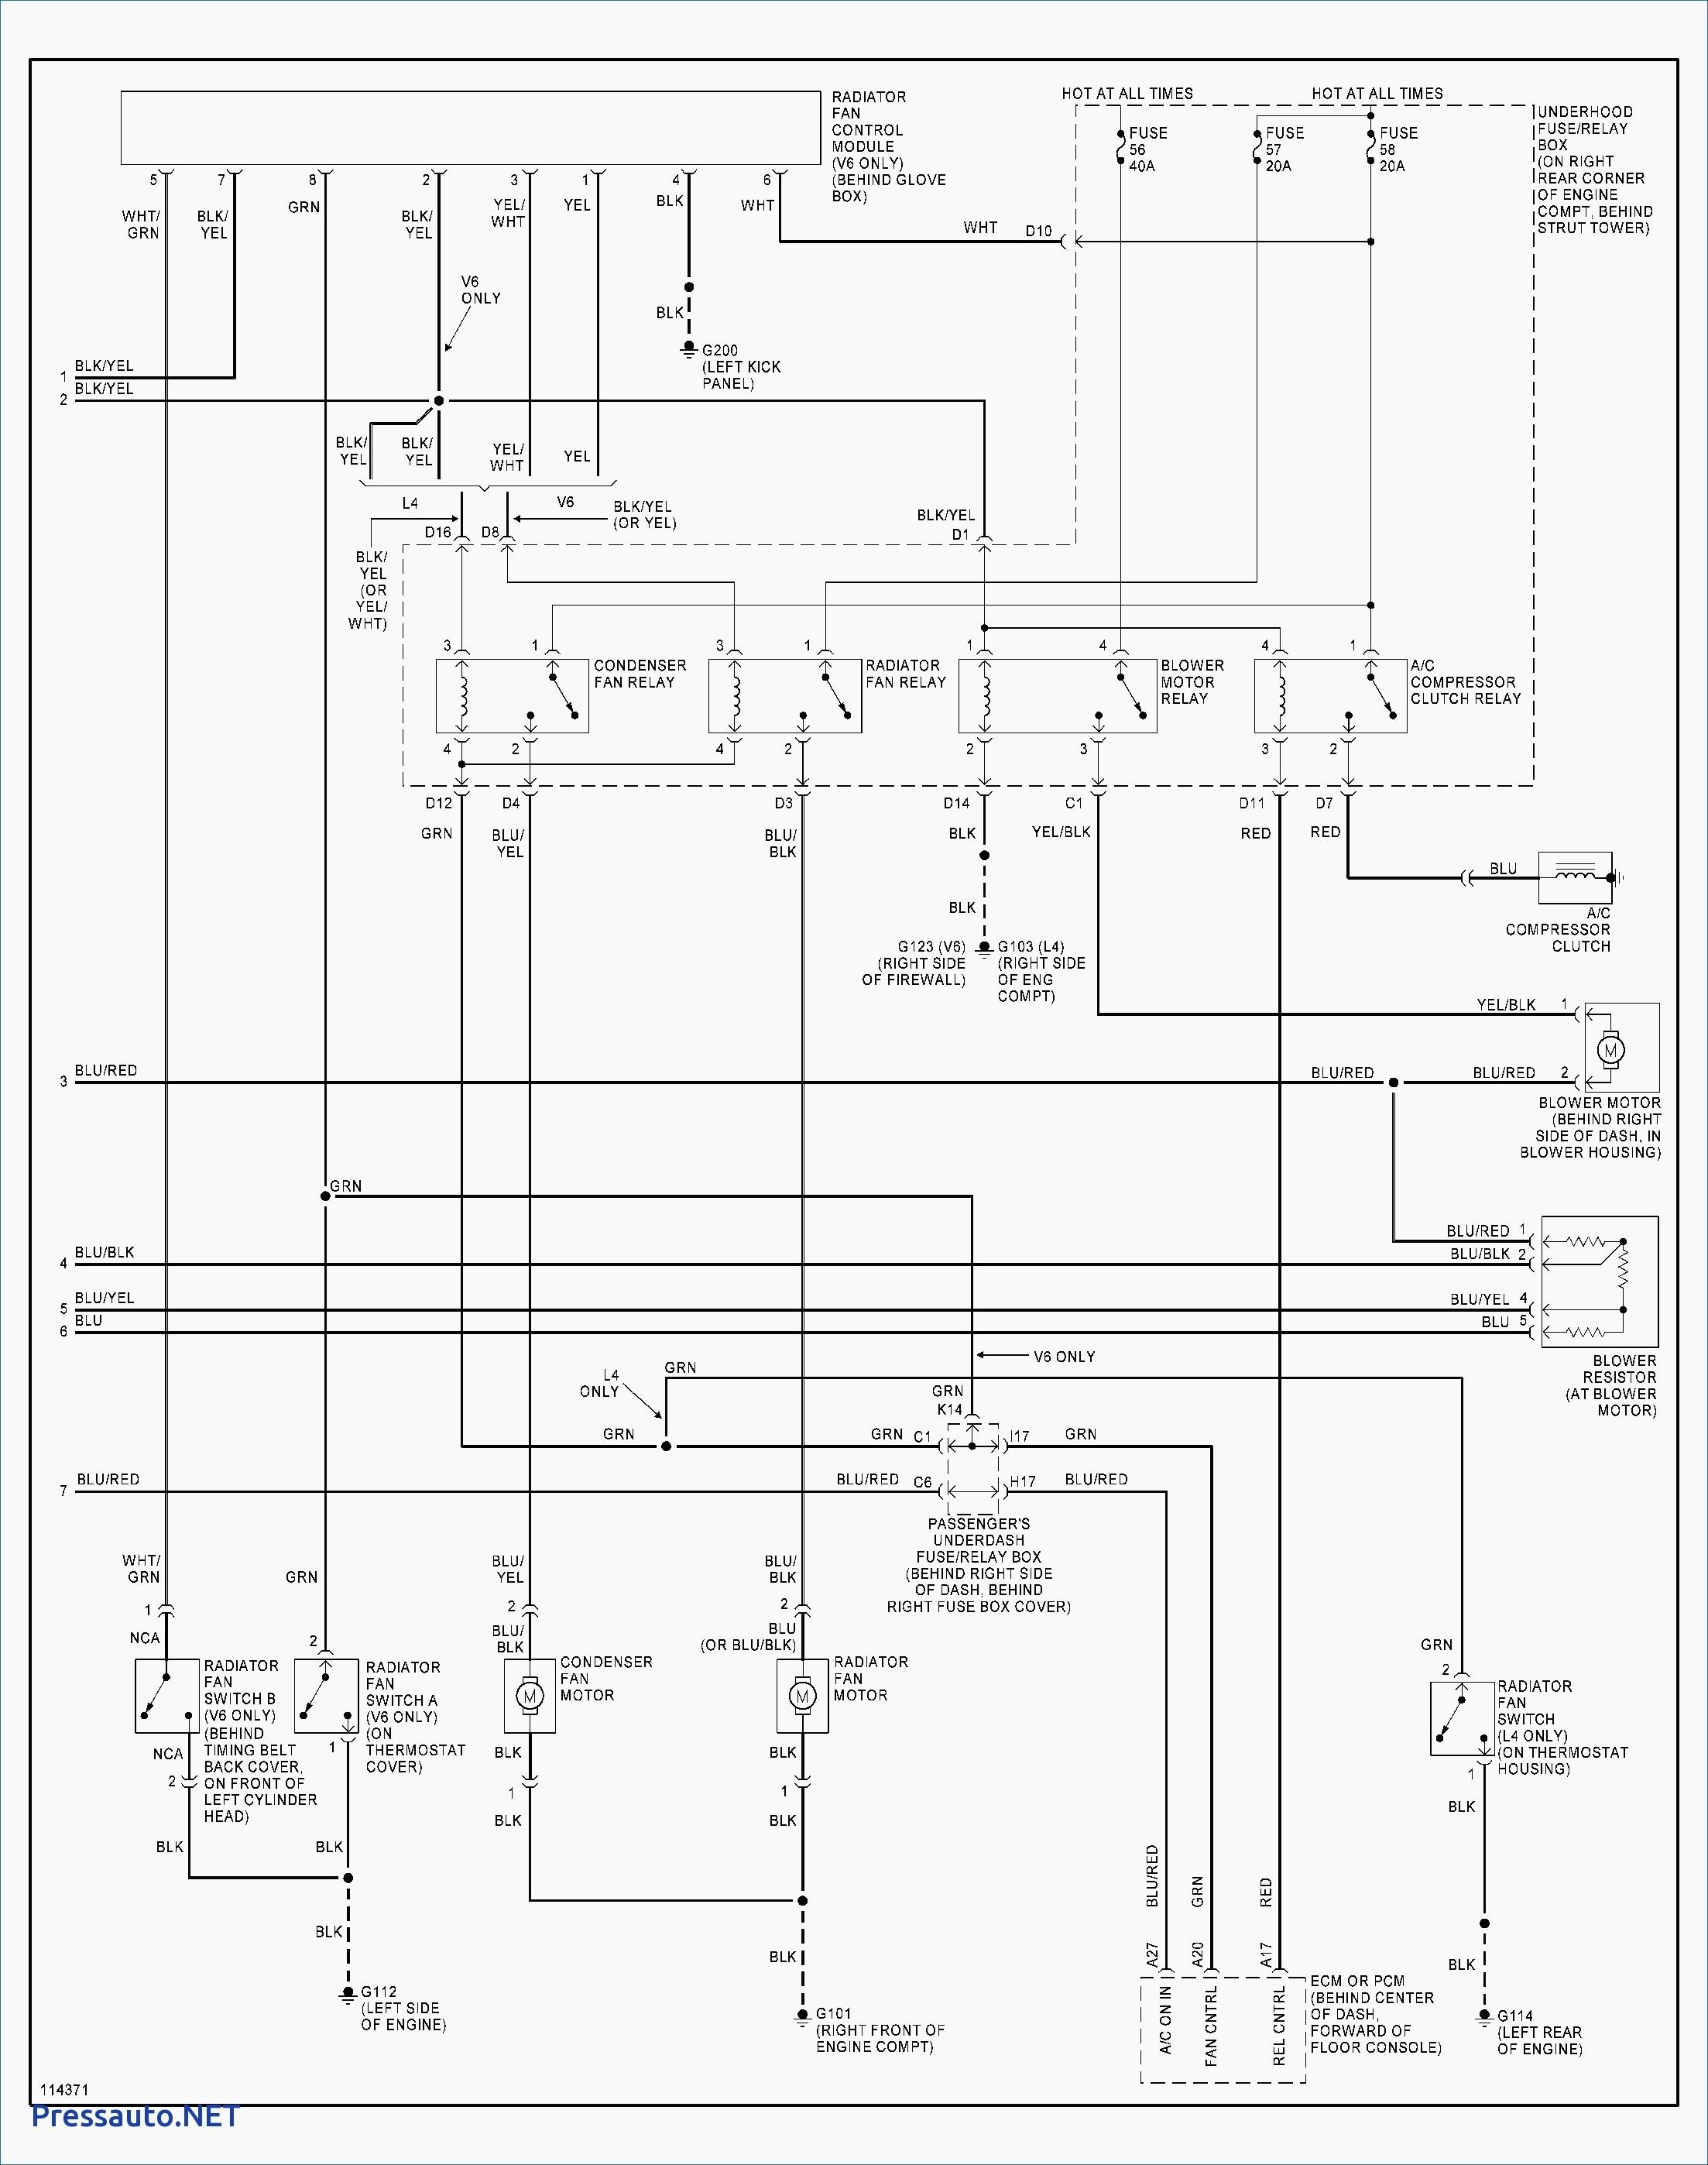 2000 Honda Accord Wiring Diagram Free Honda Wiring Diagram Another Blog About Wiring Diagram • Of 2000 Honda Accord Wiring Diagram